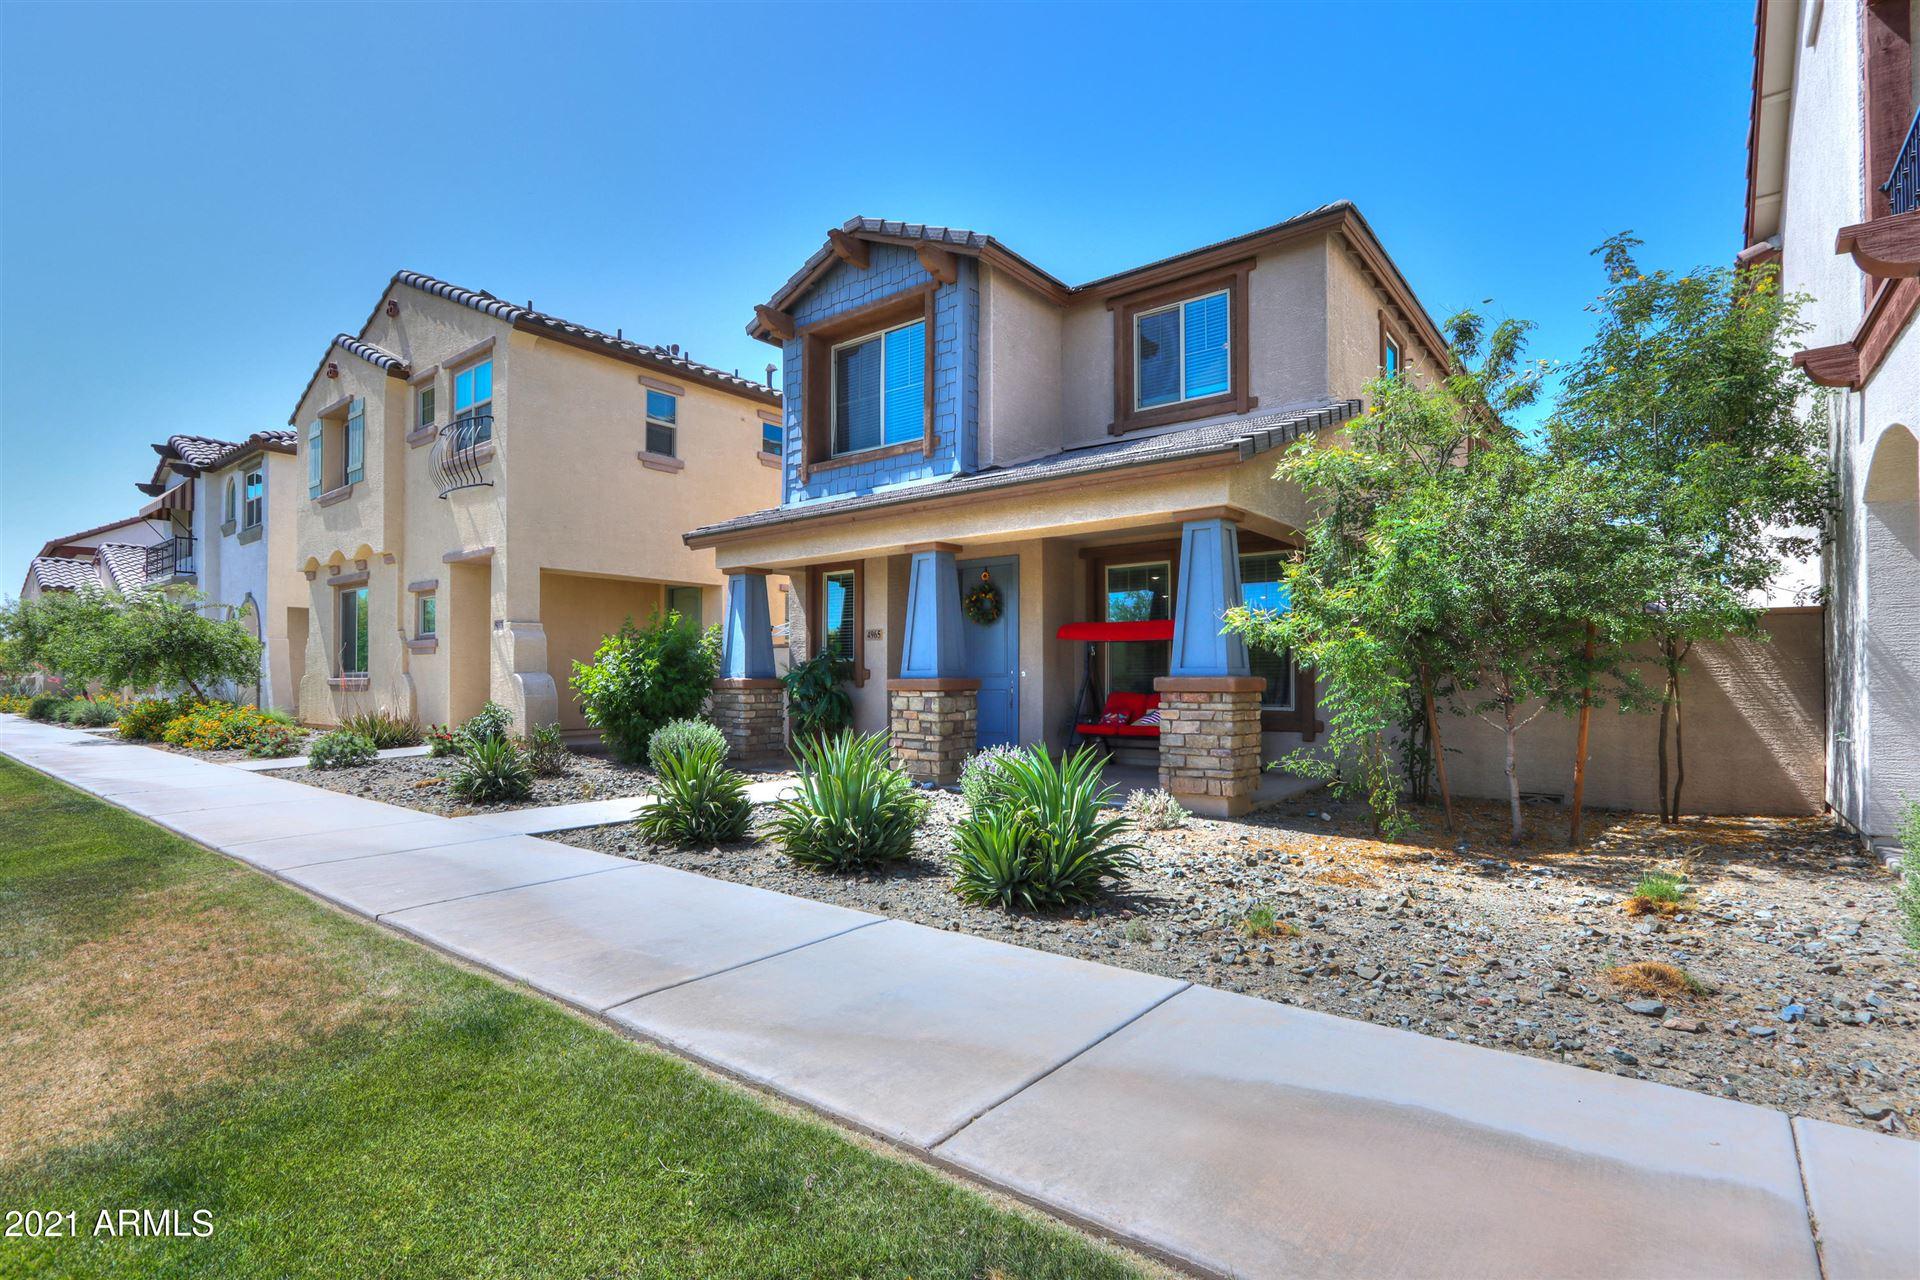 Photo of 4965 S TURBINE --, Mesa, AZ 85212 (MLS # 6232569)